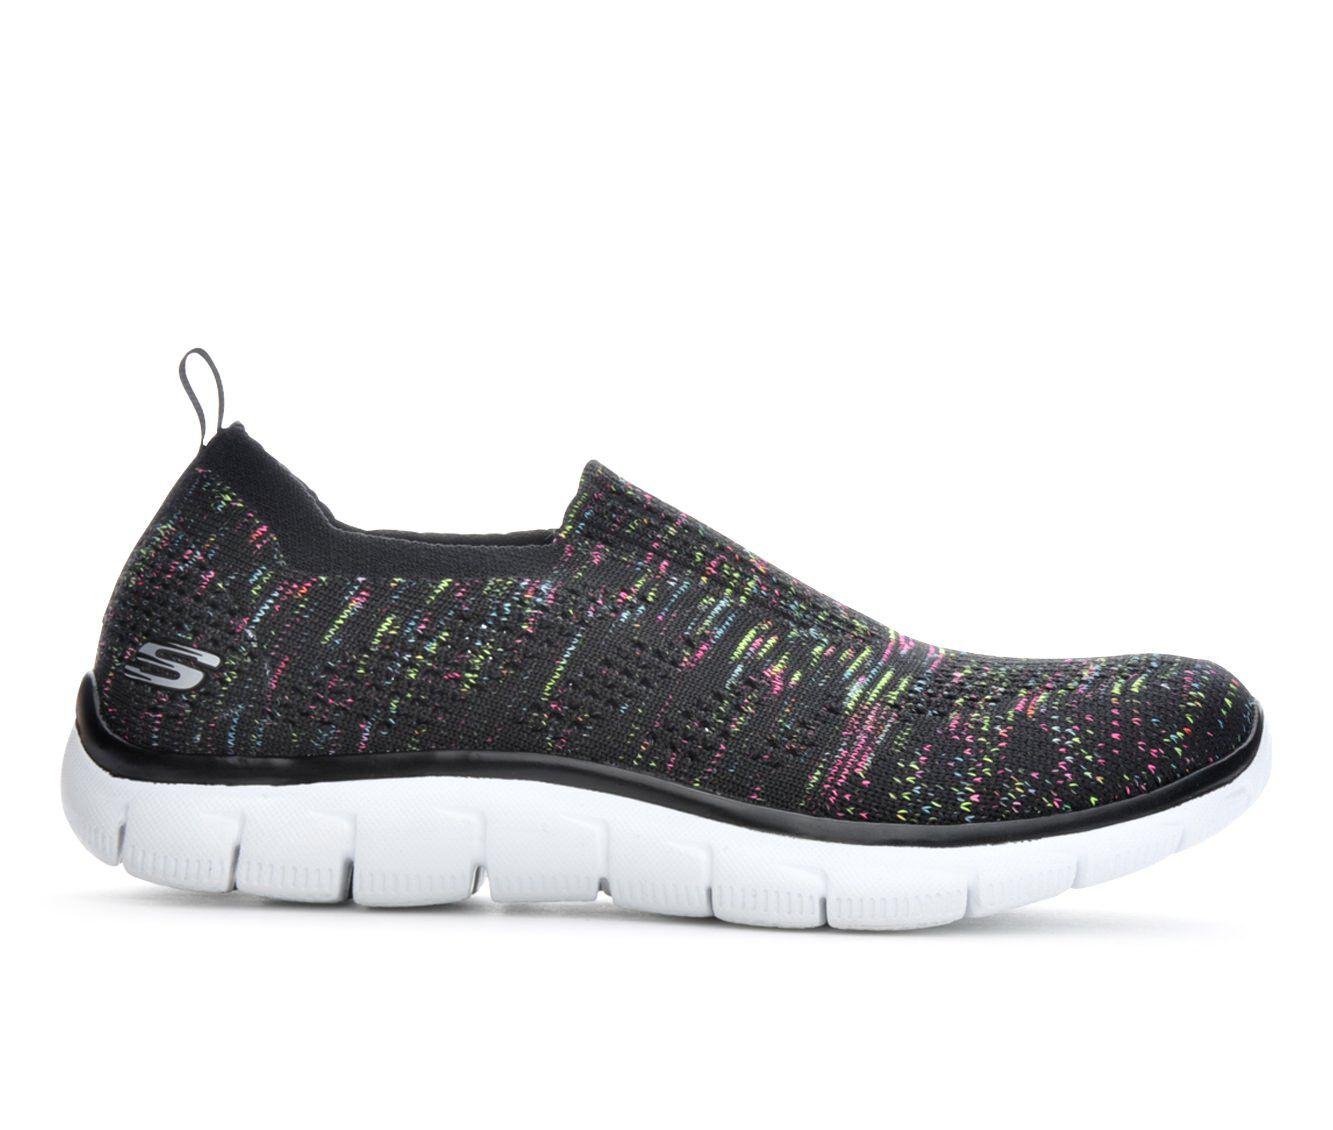 Women's Skechers Inside Look 12419 Slip-On Sneakers outlet geniue stockist cheap shop for best seller online Kp0FGSs3rn